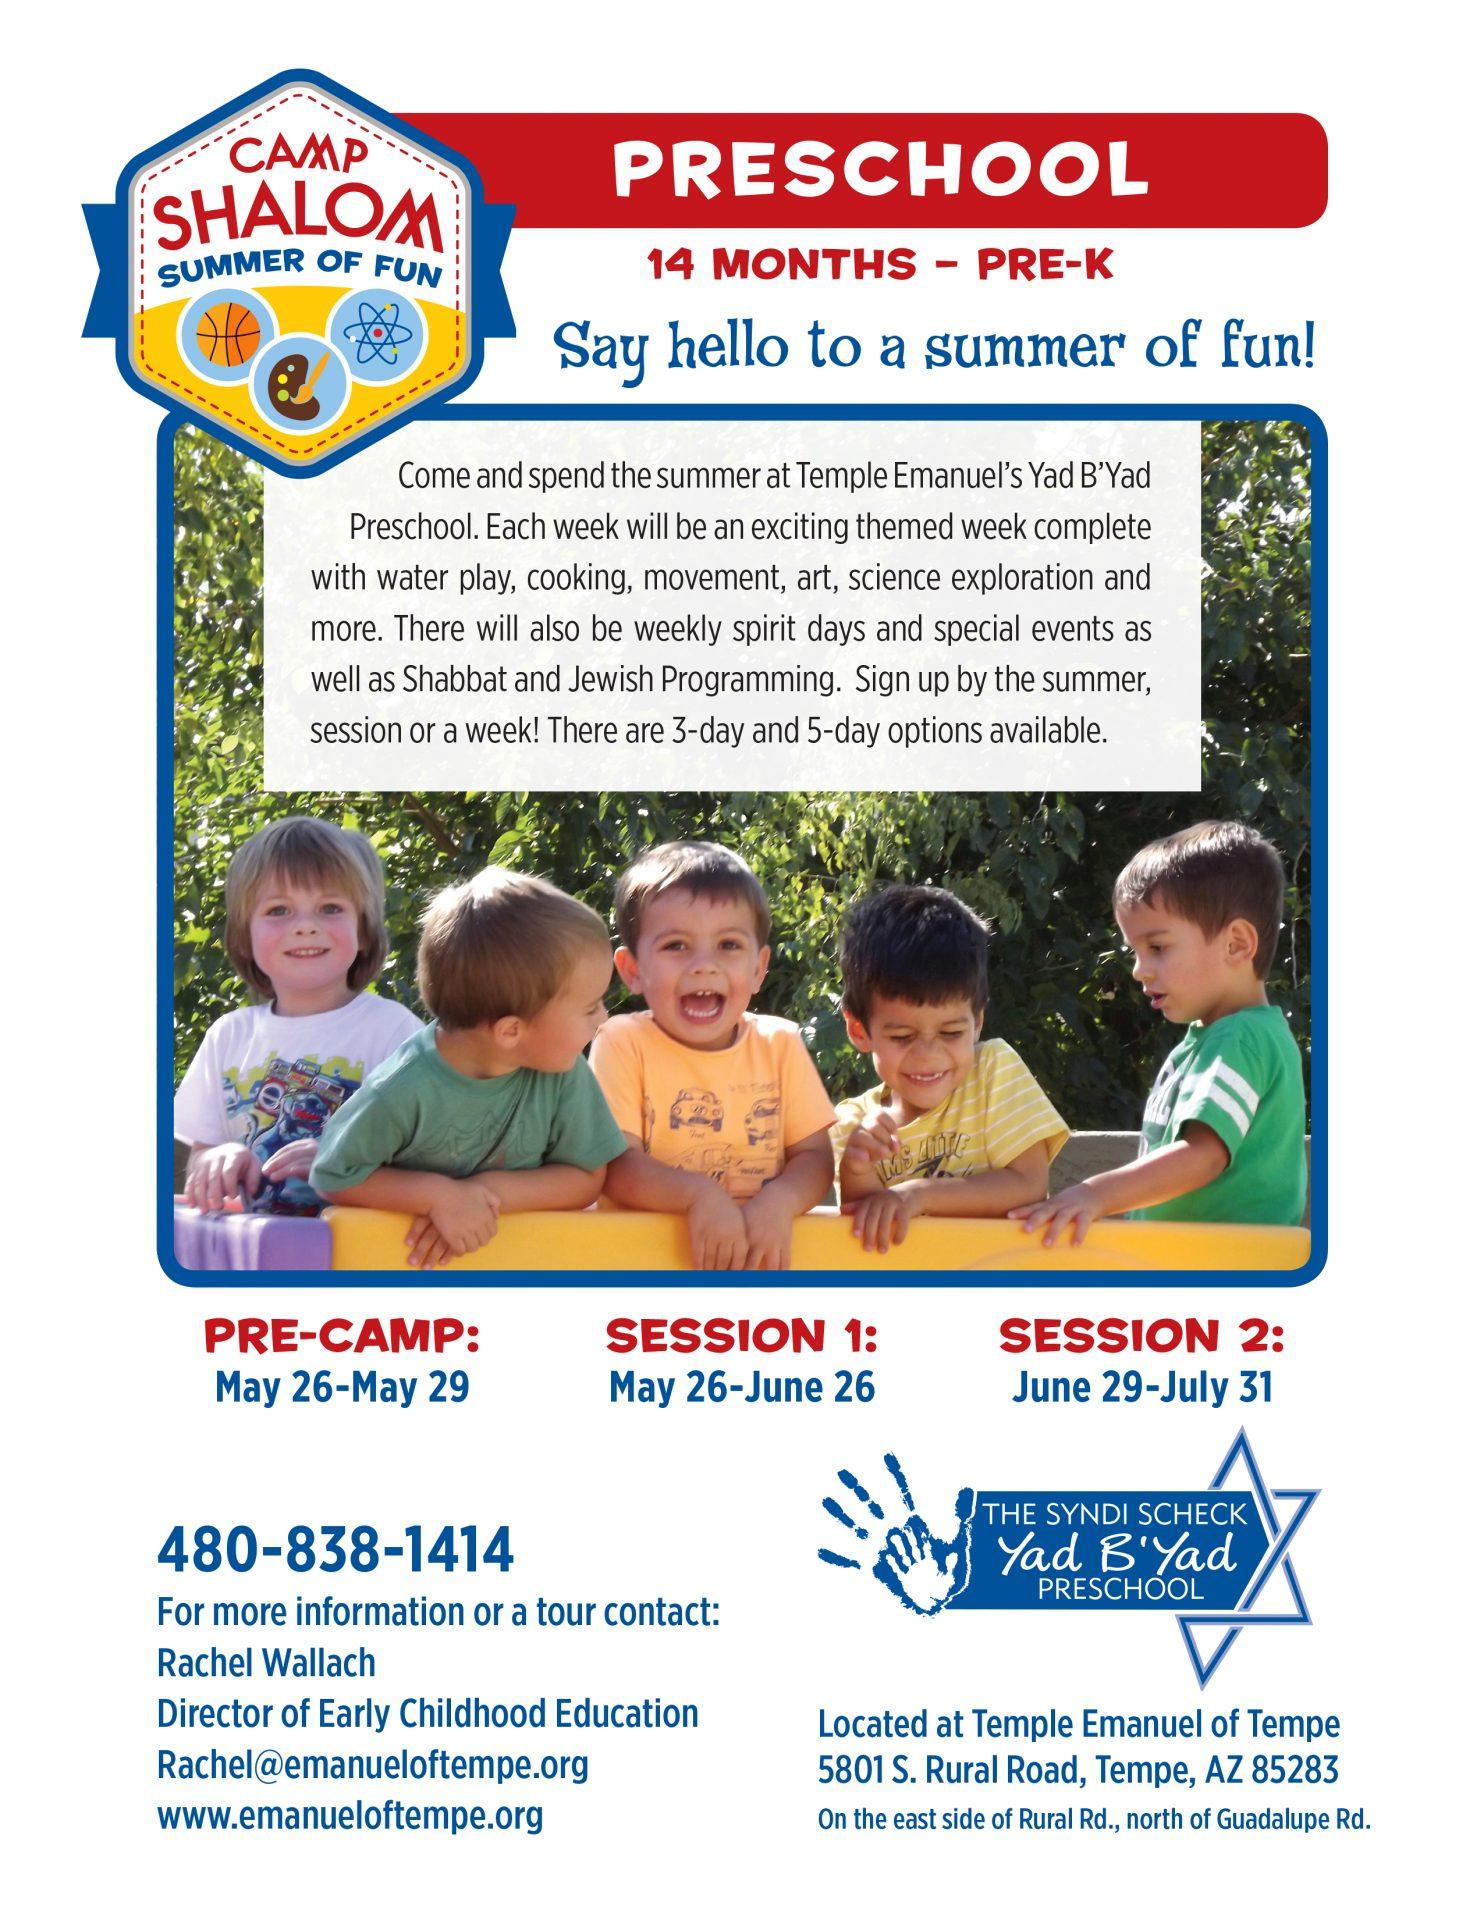 Temple-Emanuel-Camp-Shalom-Preschool-Flyer-2015